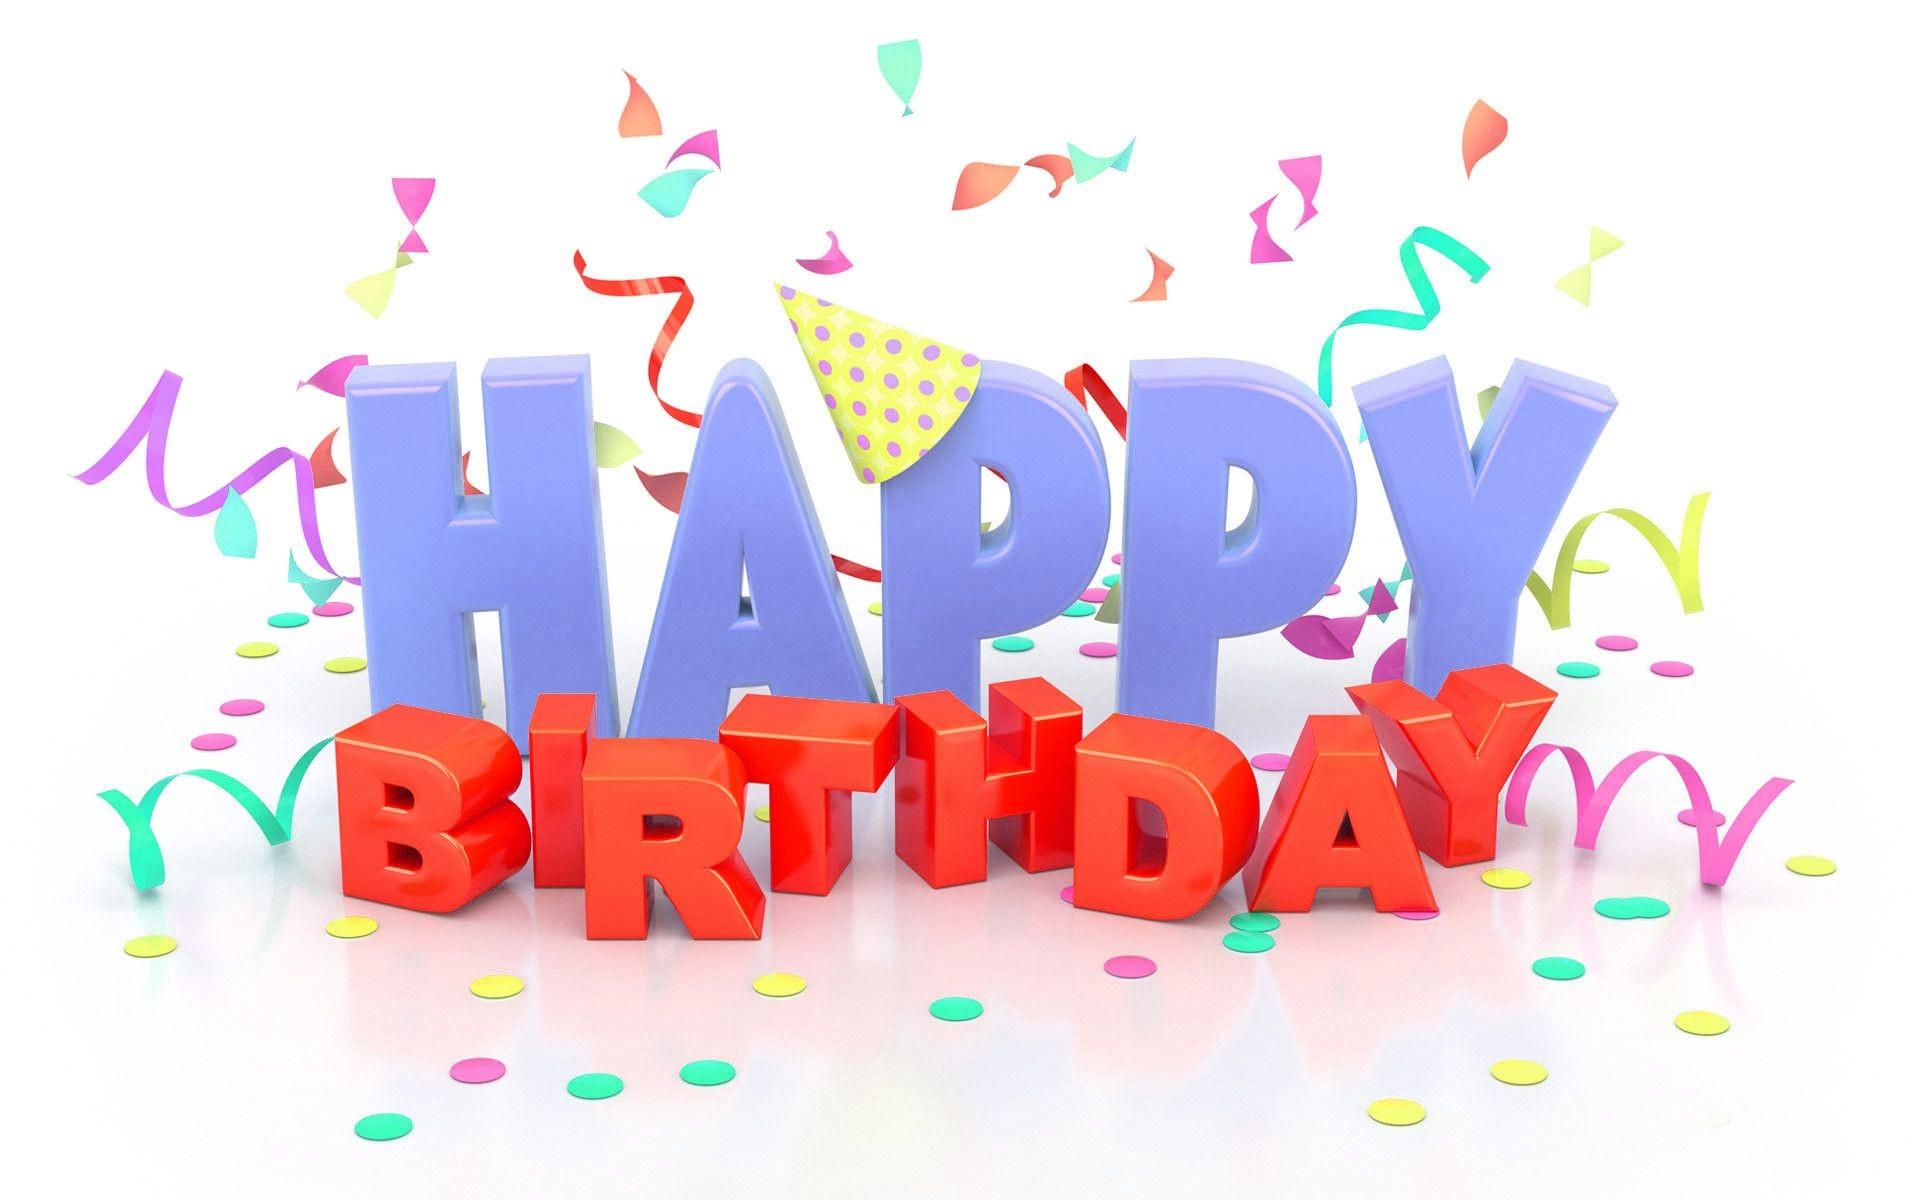 Happy birthday wallpaper download free full hd - Zedge happy birthday wallpapers ...